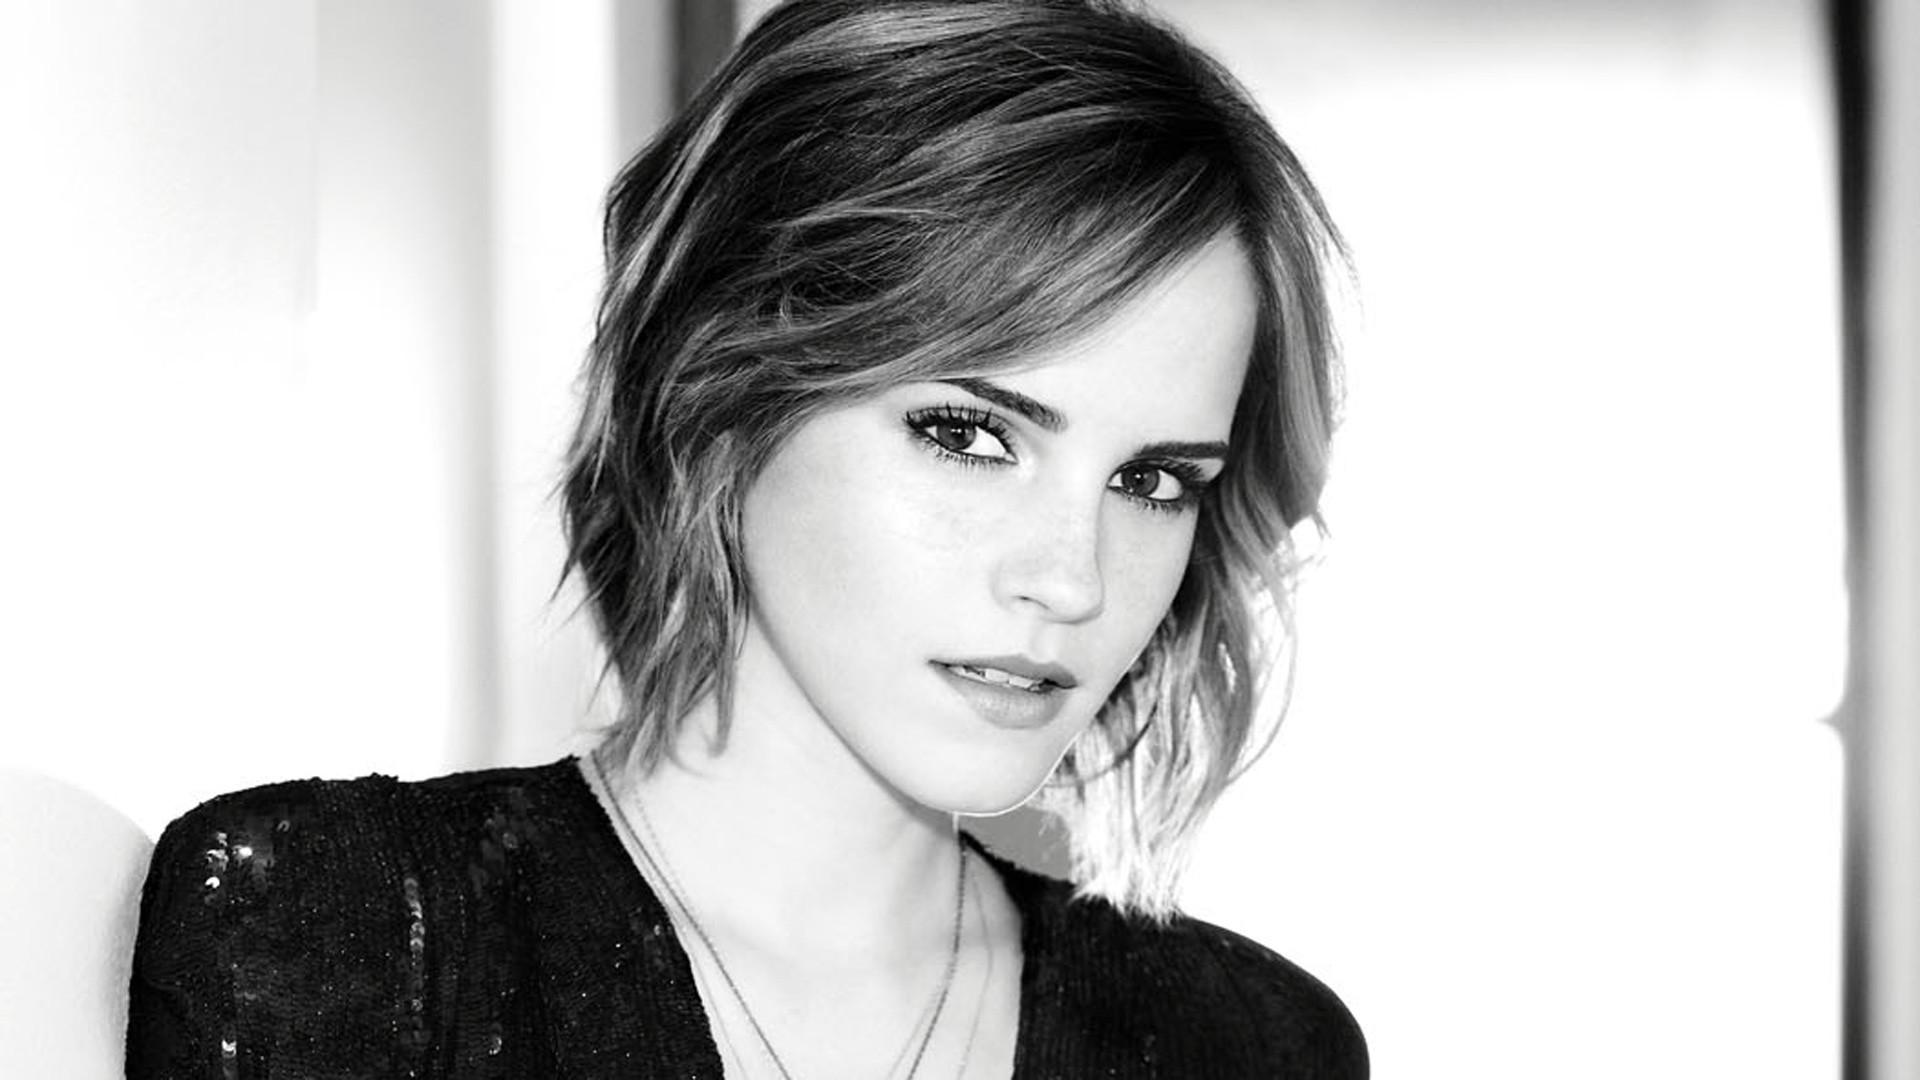 1920x1080 Emma Watson Wallpapers Celebrities HD Page Download 1920x1200